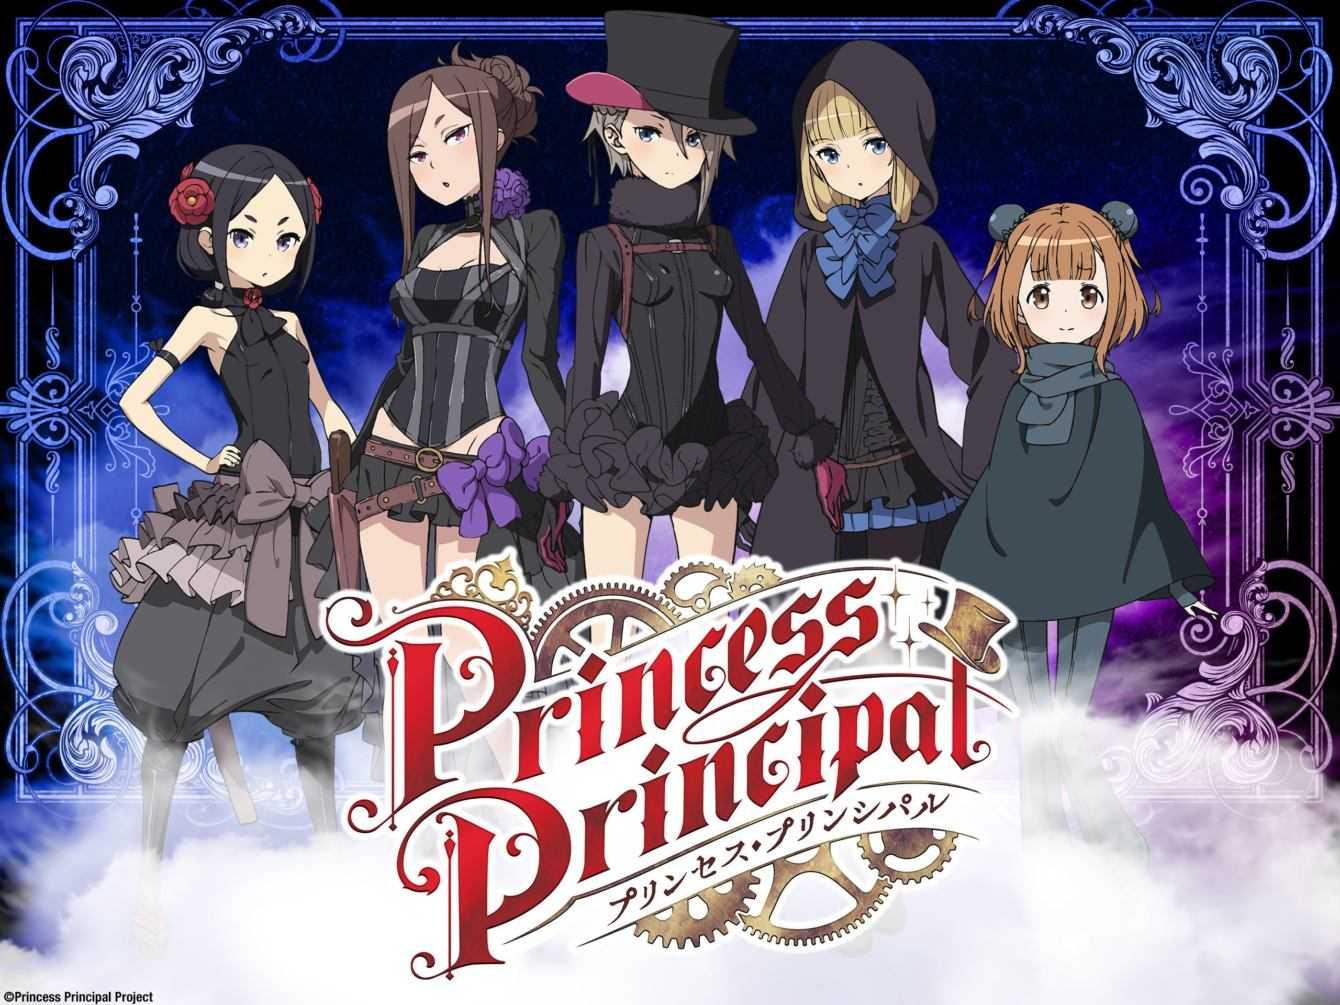 Princess Principal: arriva l'adattamento manga di Ryou Akizuki